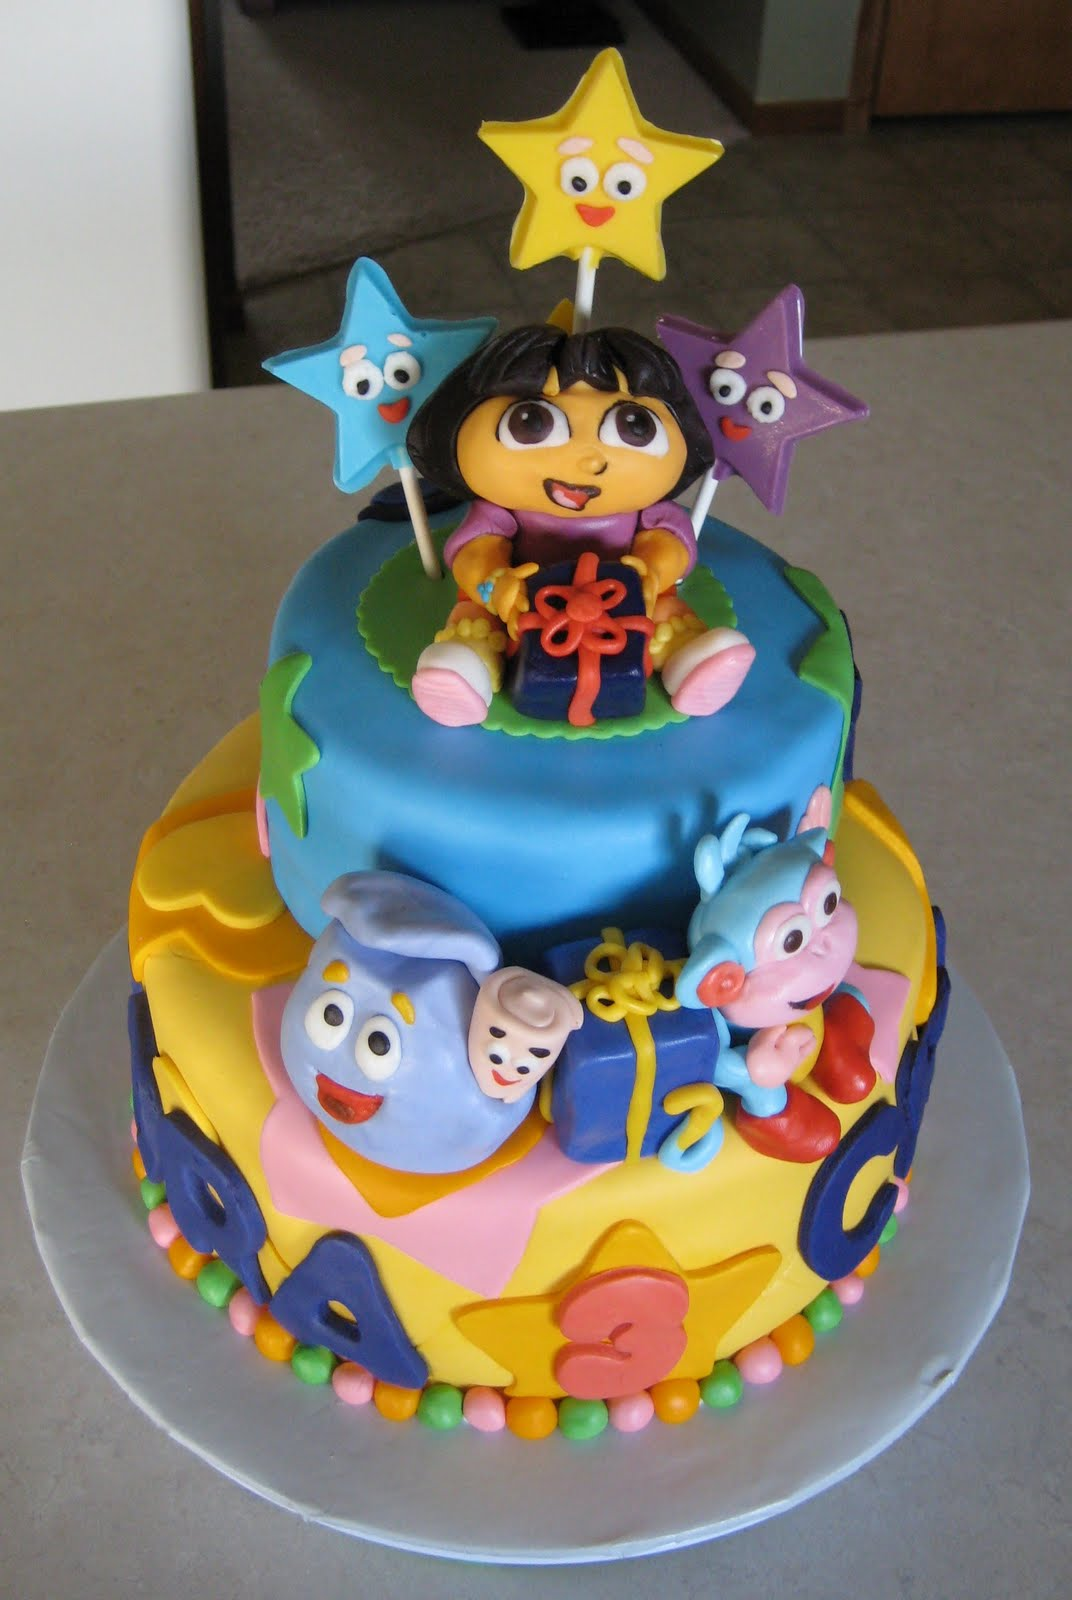 Dora 2 year old birthday cake Beautiful cakes photo blog